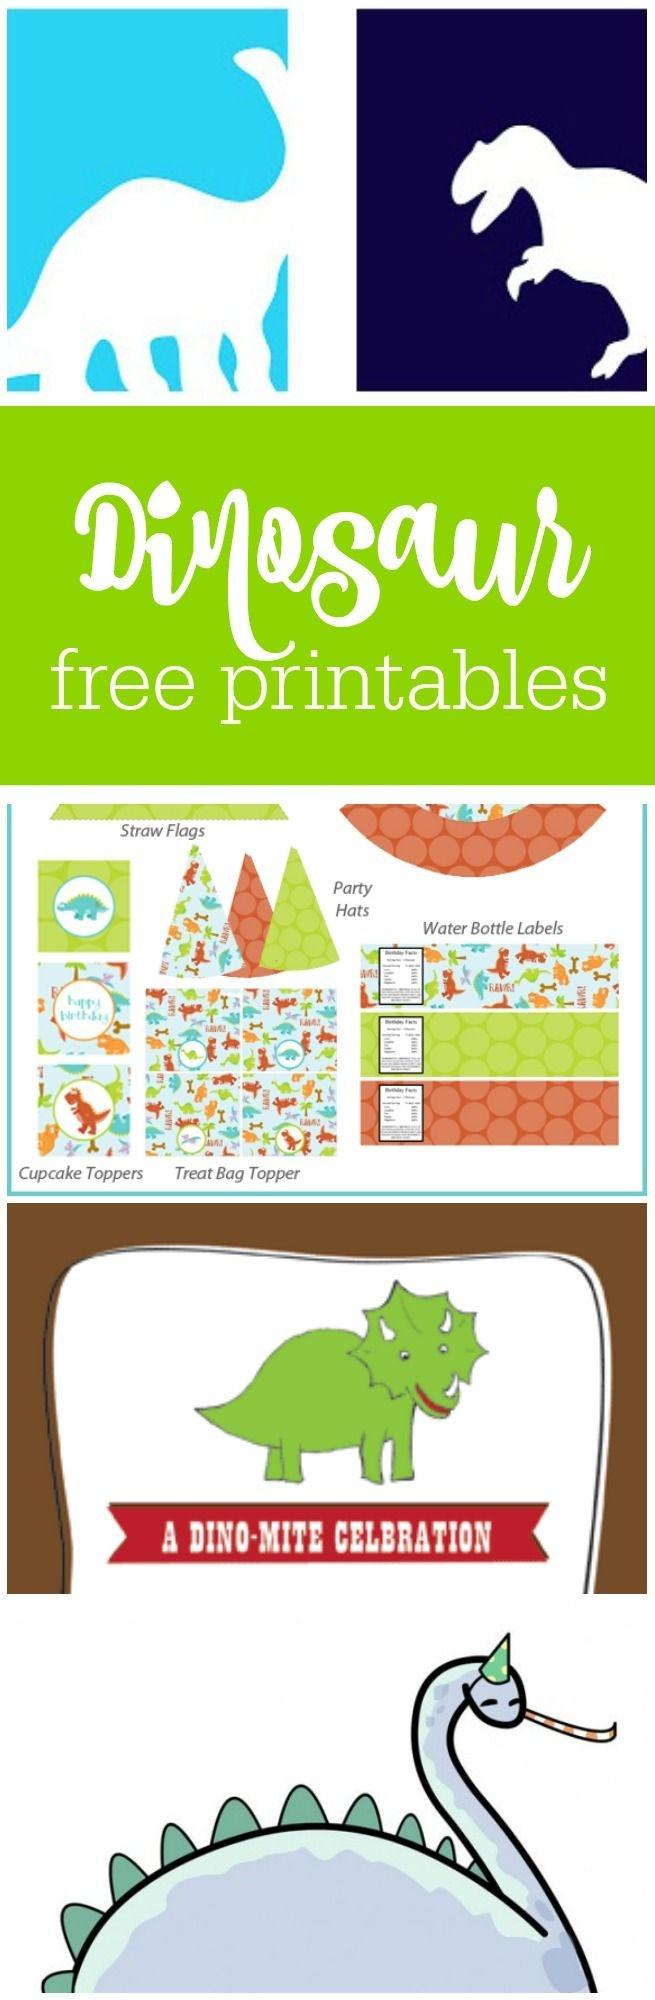 Freebie Friday: Free Dinosaur Party Printables   Baby Ninjas Bday - Free Printable Dinosaur Labels